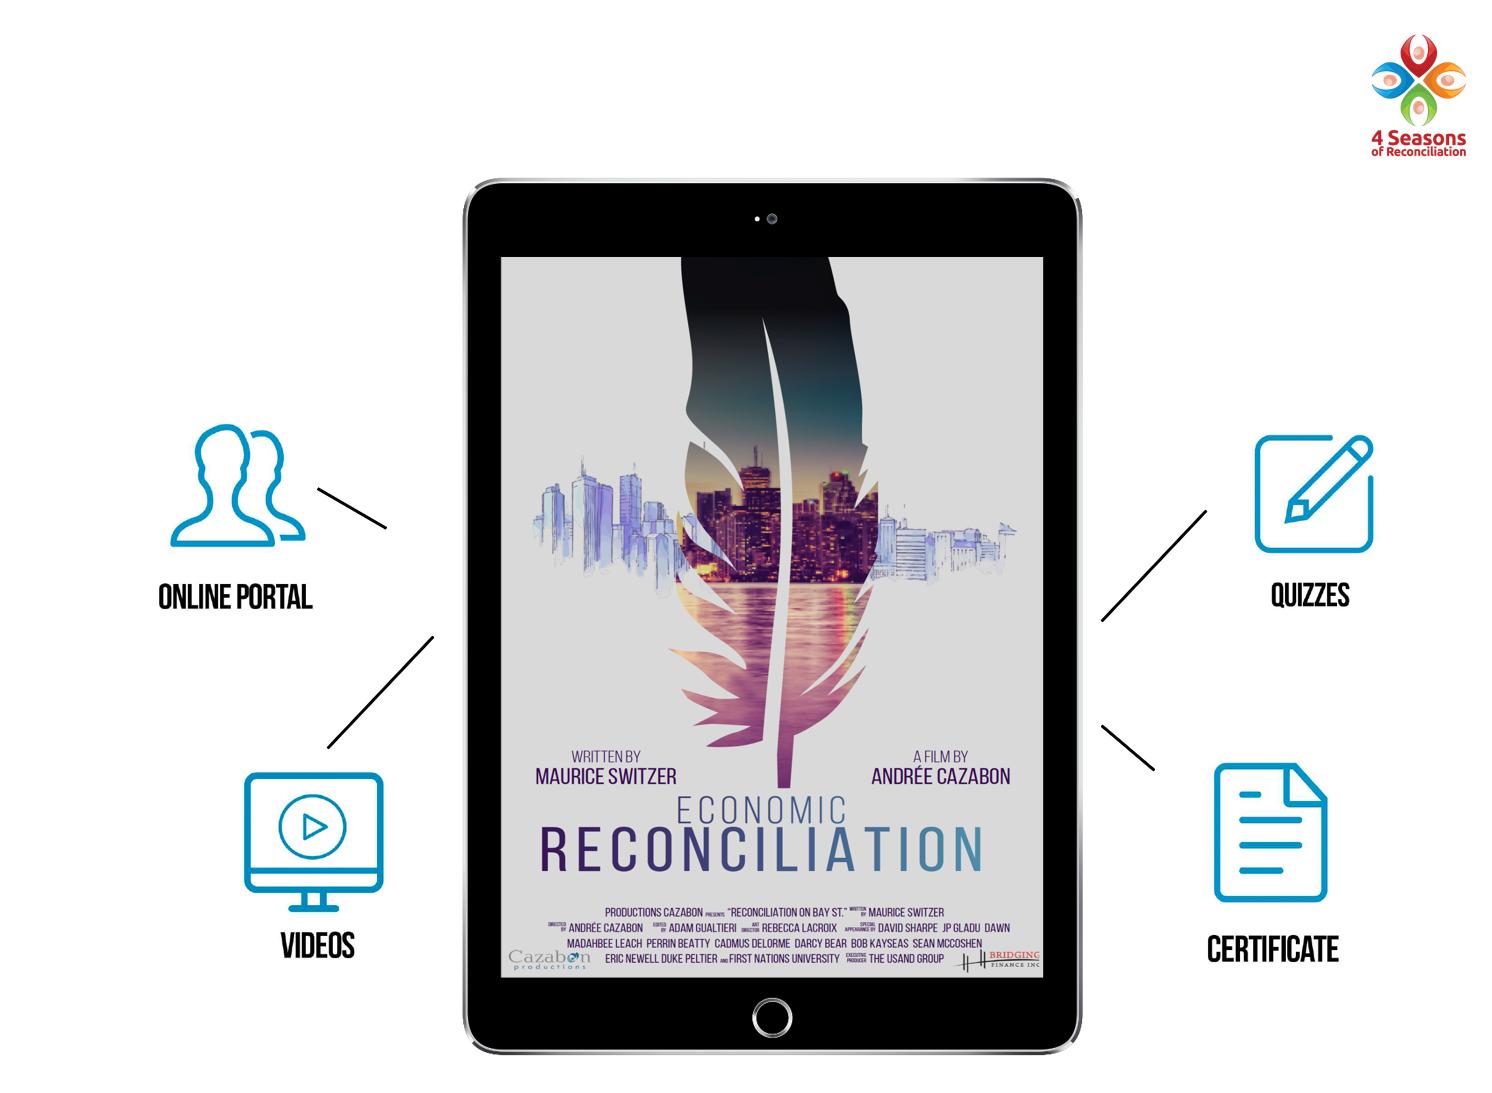 Device+Showing+Economic+Reconciliation+Movie